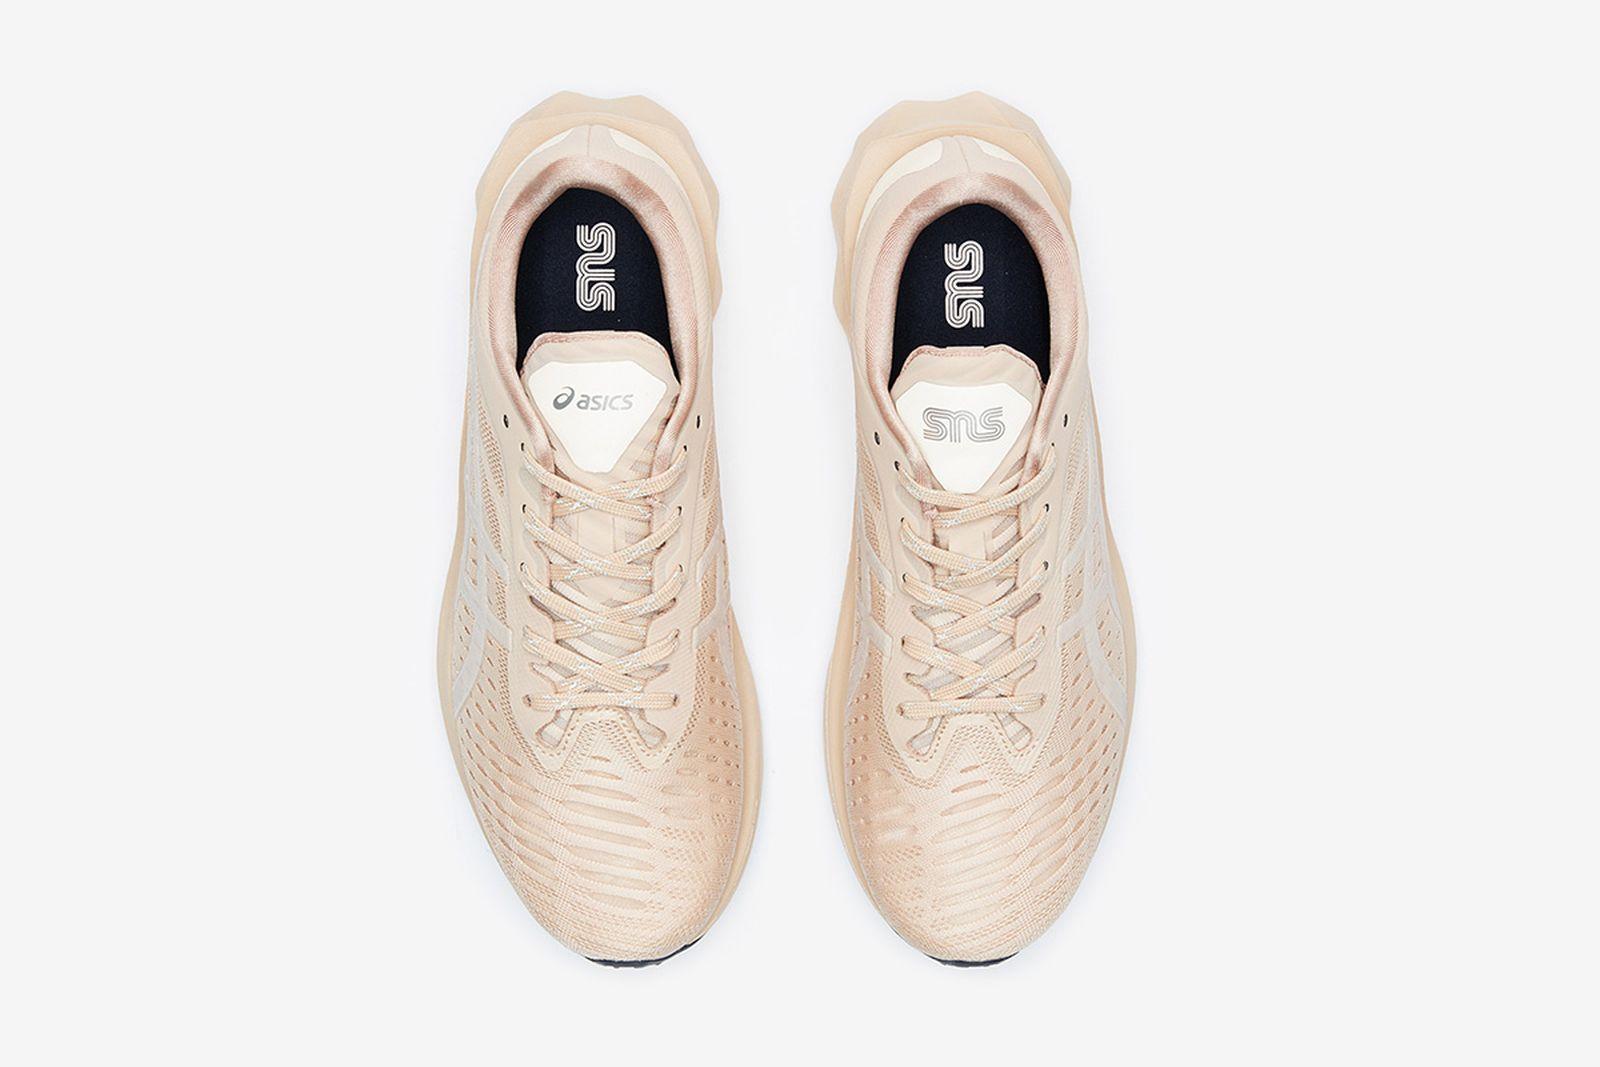 sneakersnstuff-asics-novablast-release-date-price-02